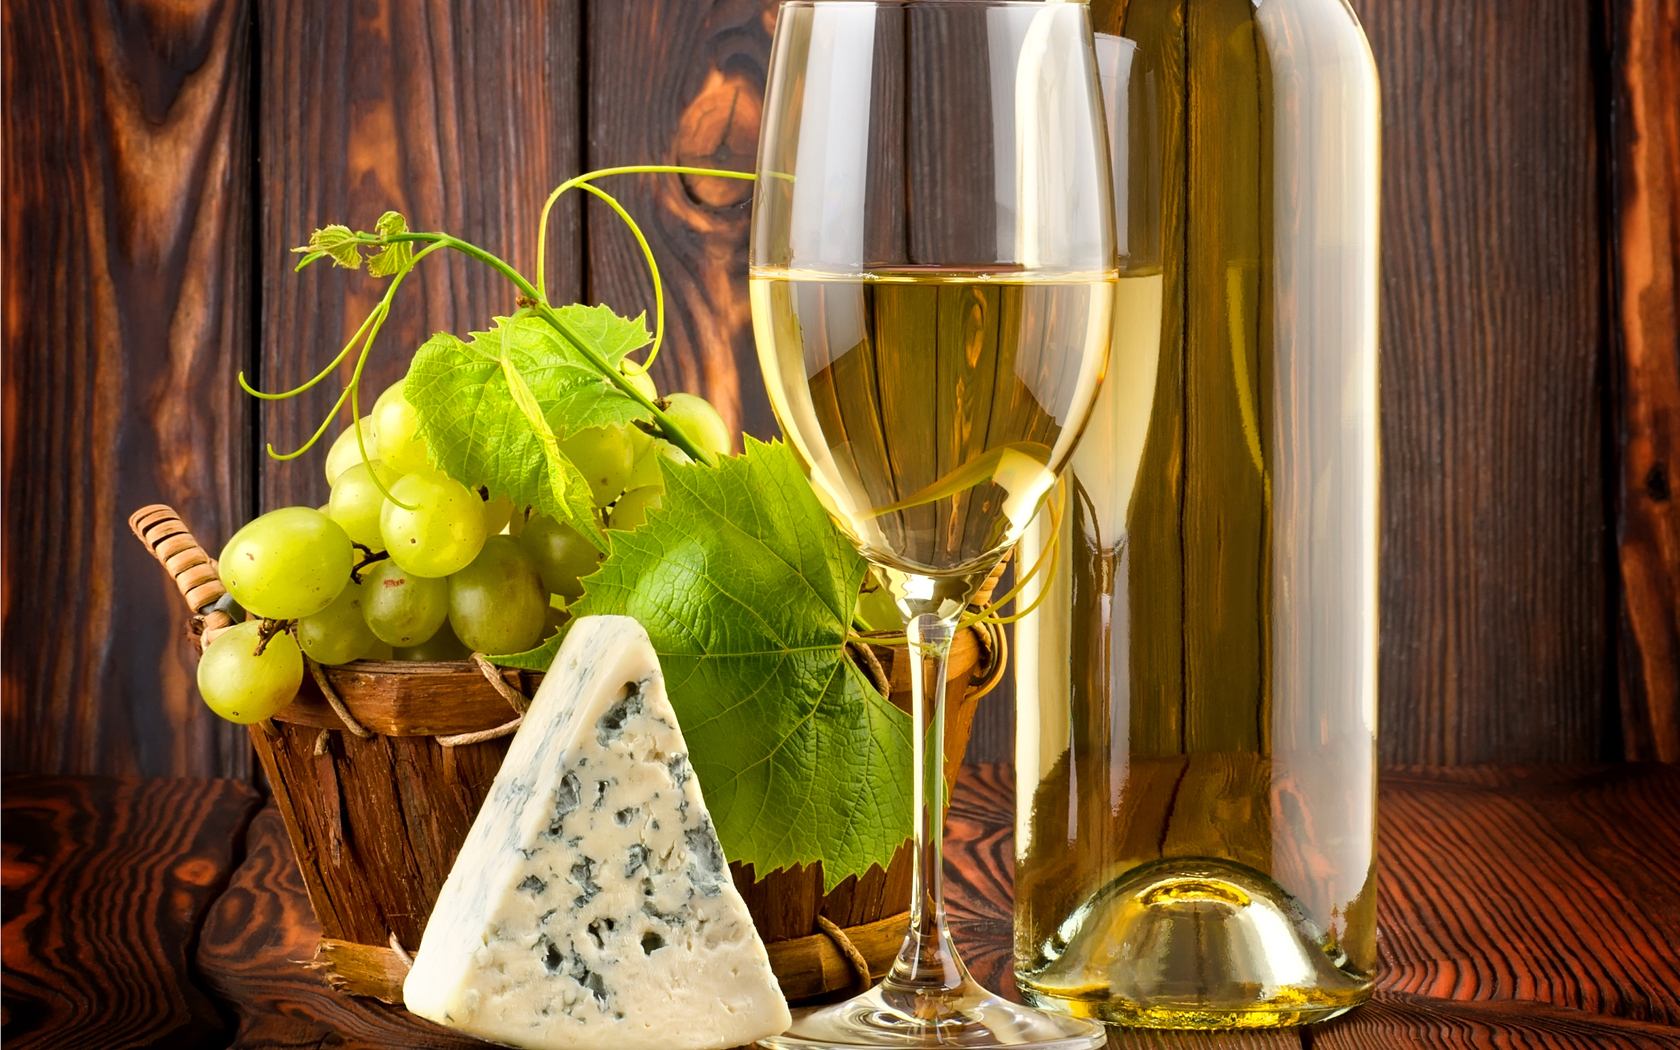 415495_stol_butylka_vino_beloe_bokal_loza_listya_vinograd_1680x1050_(www.GdeFon.ru)